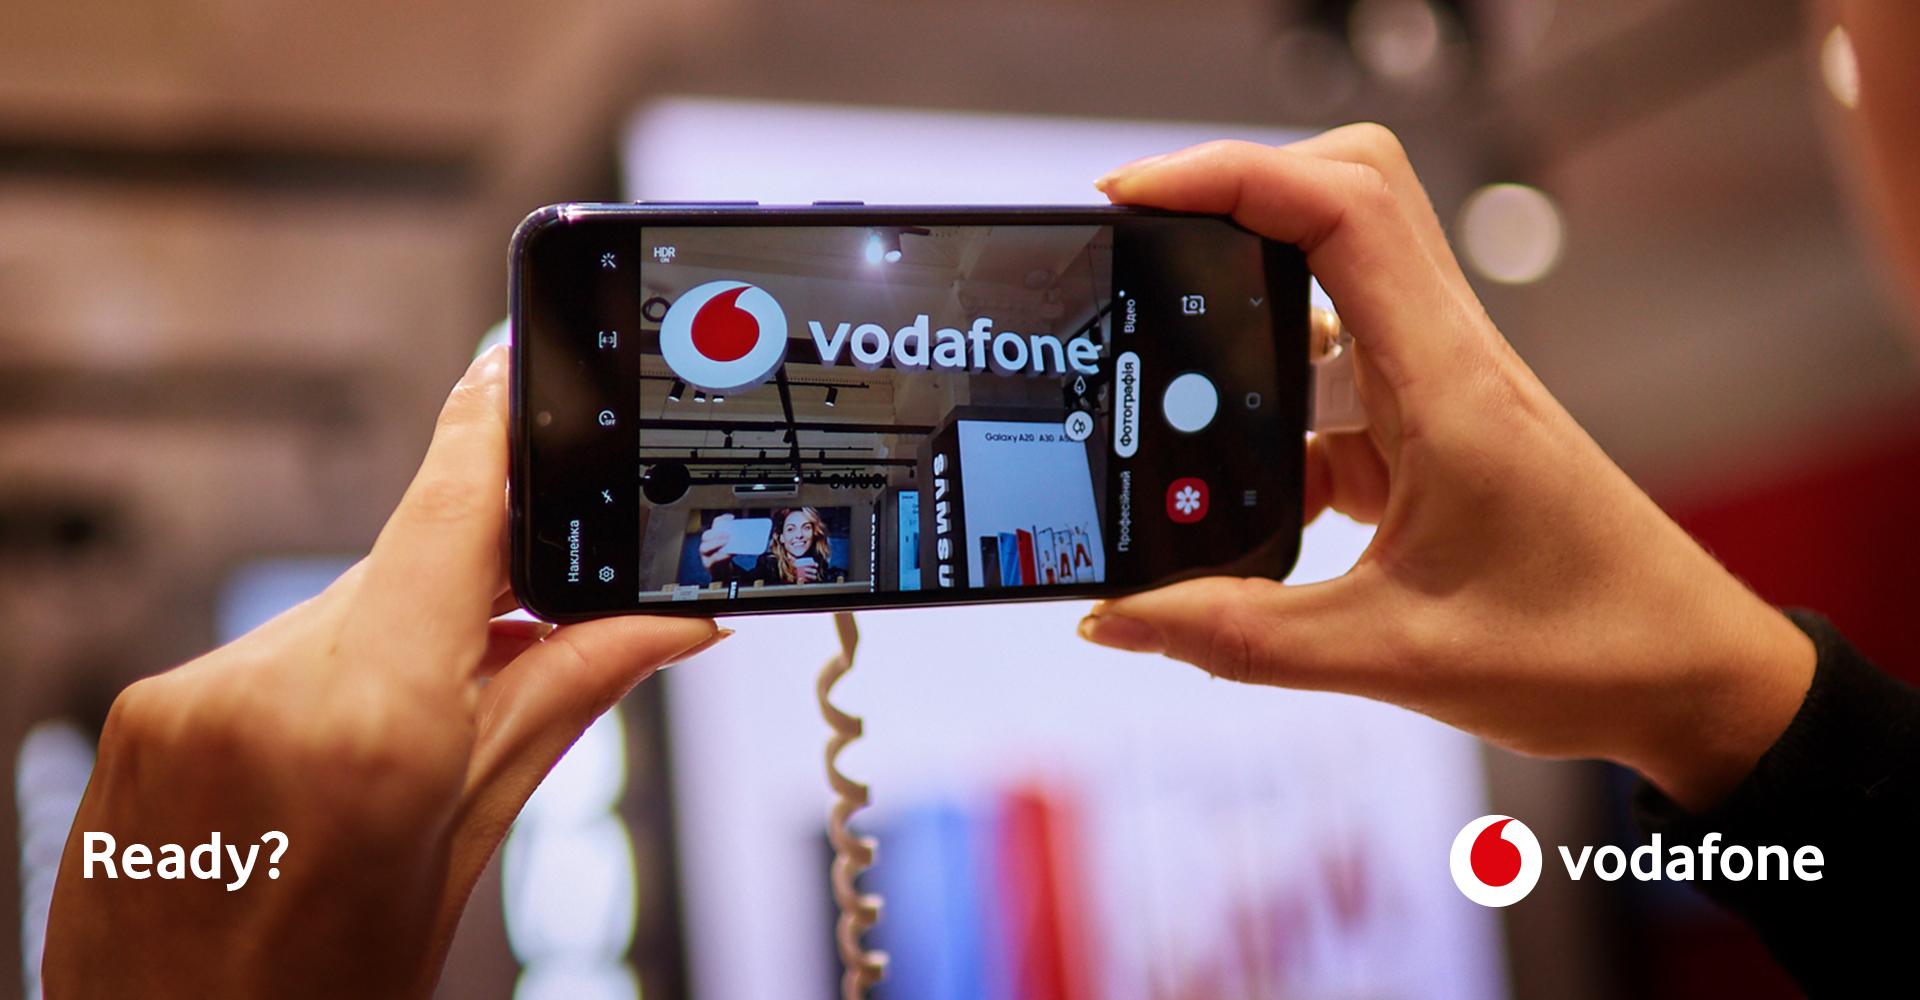 Vodafone shops